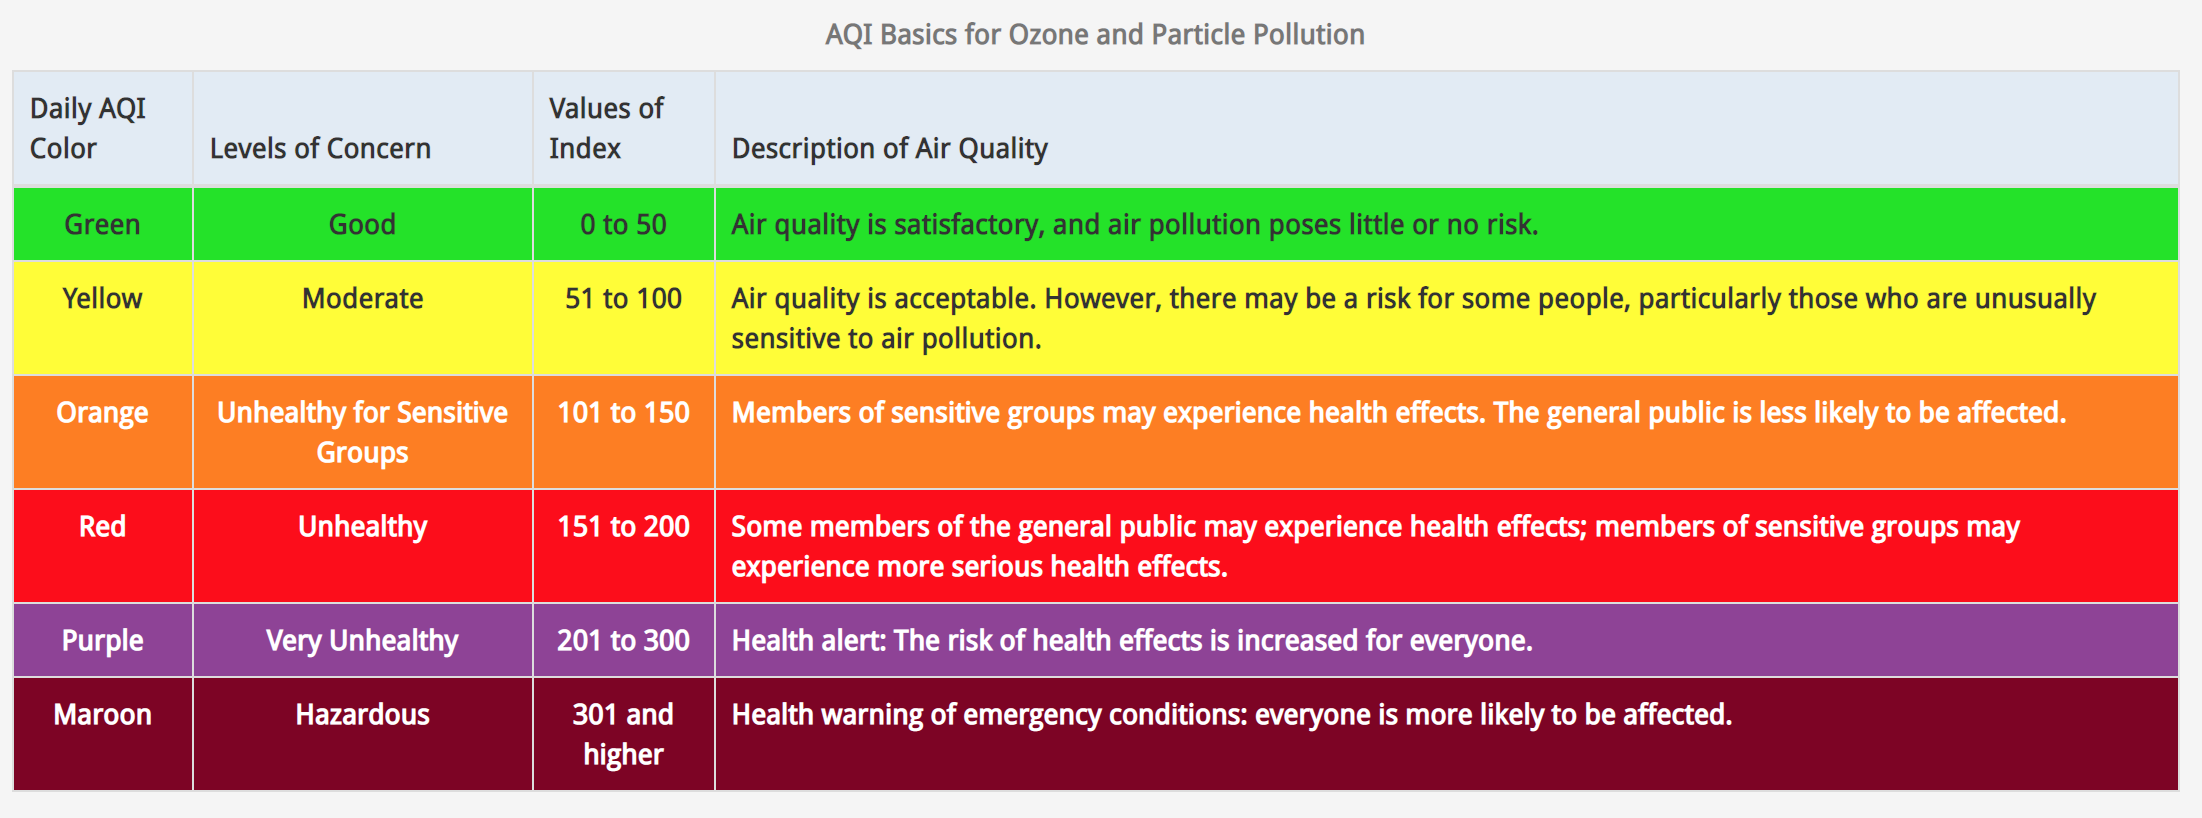 USEPA Air Quality Index Chart